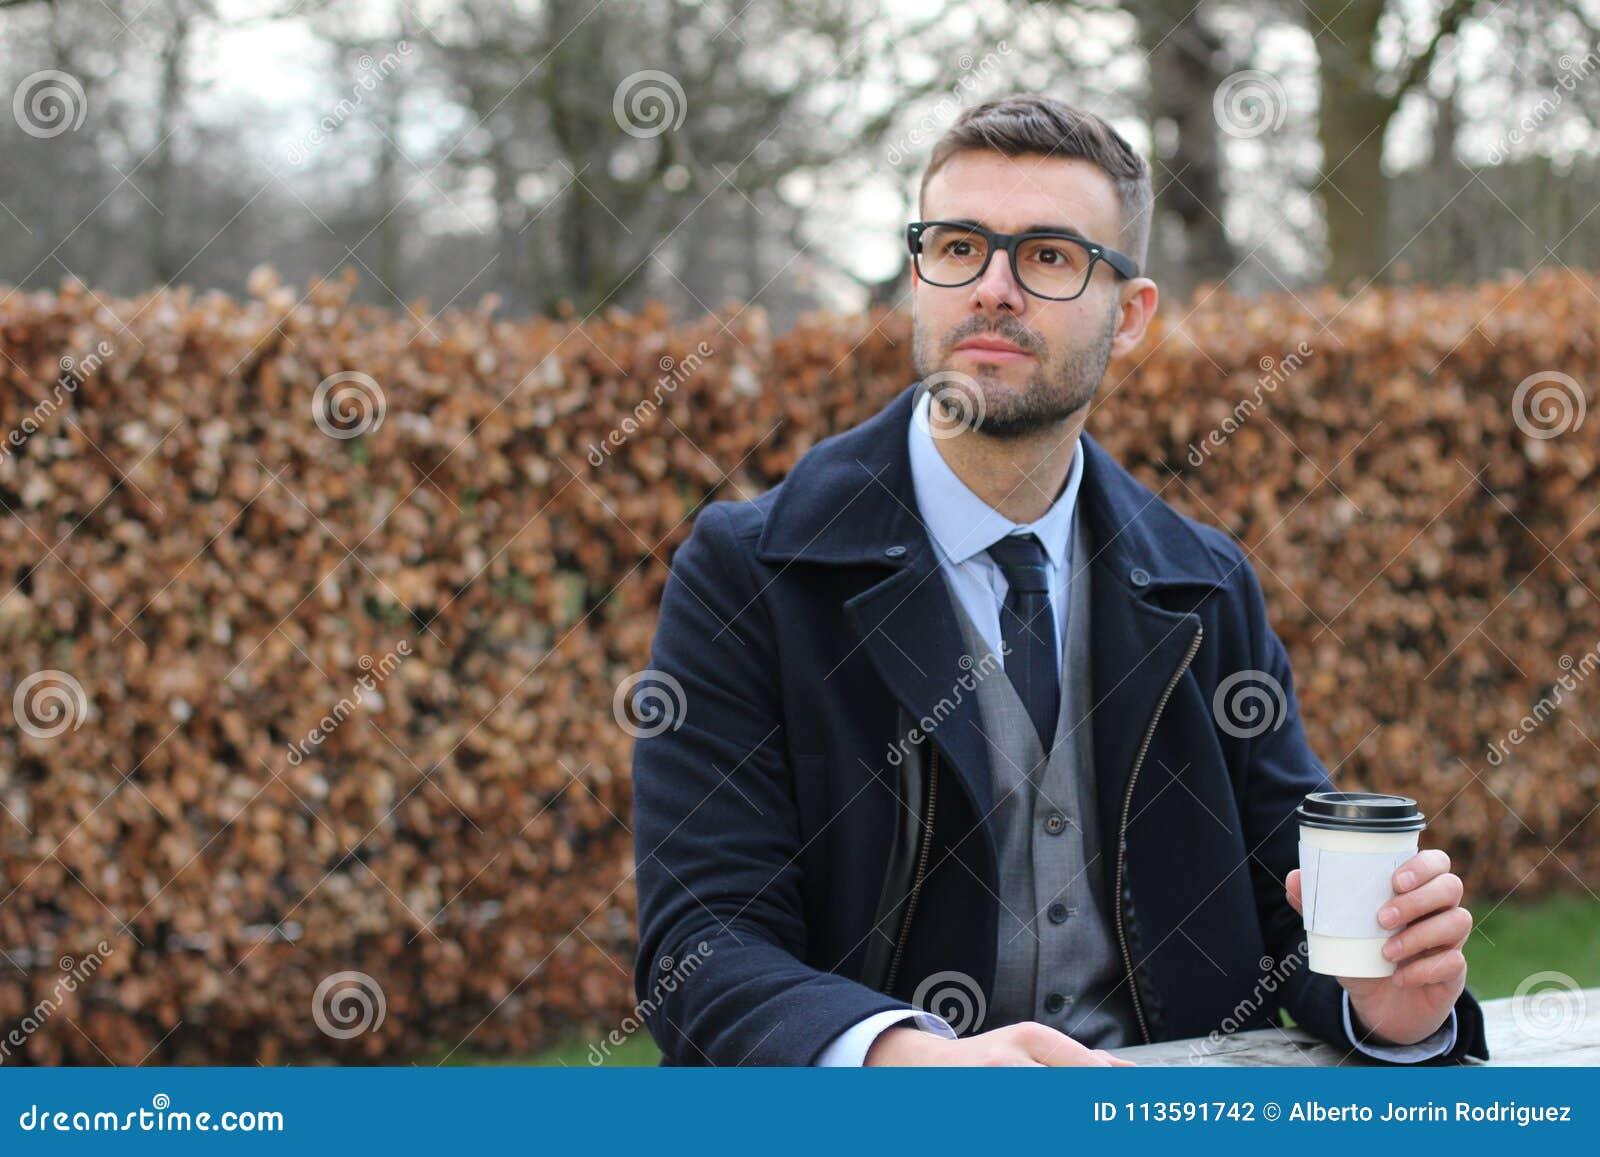 Take Break Coffeebreak : Businessman taking a coffee break stock photo image of manager